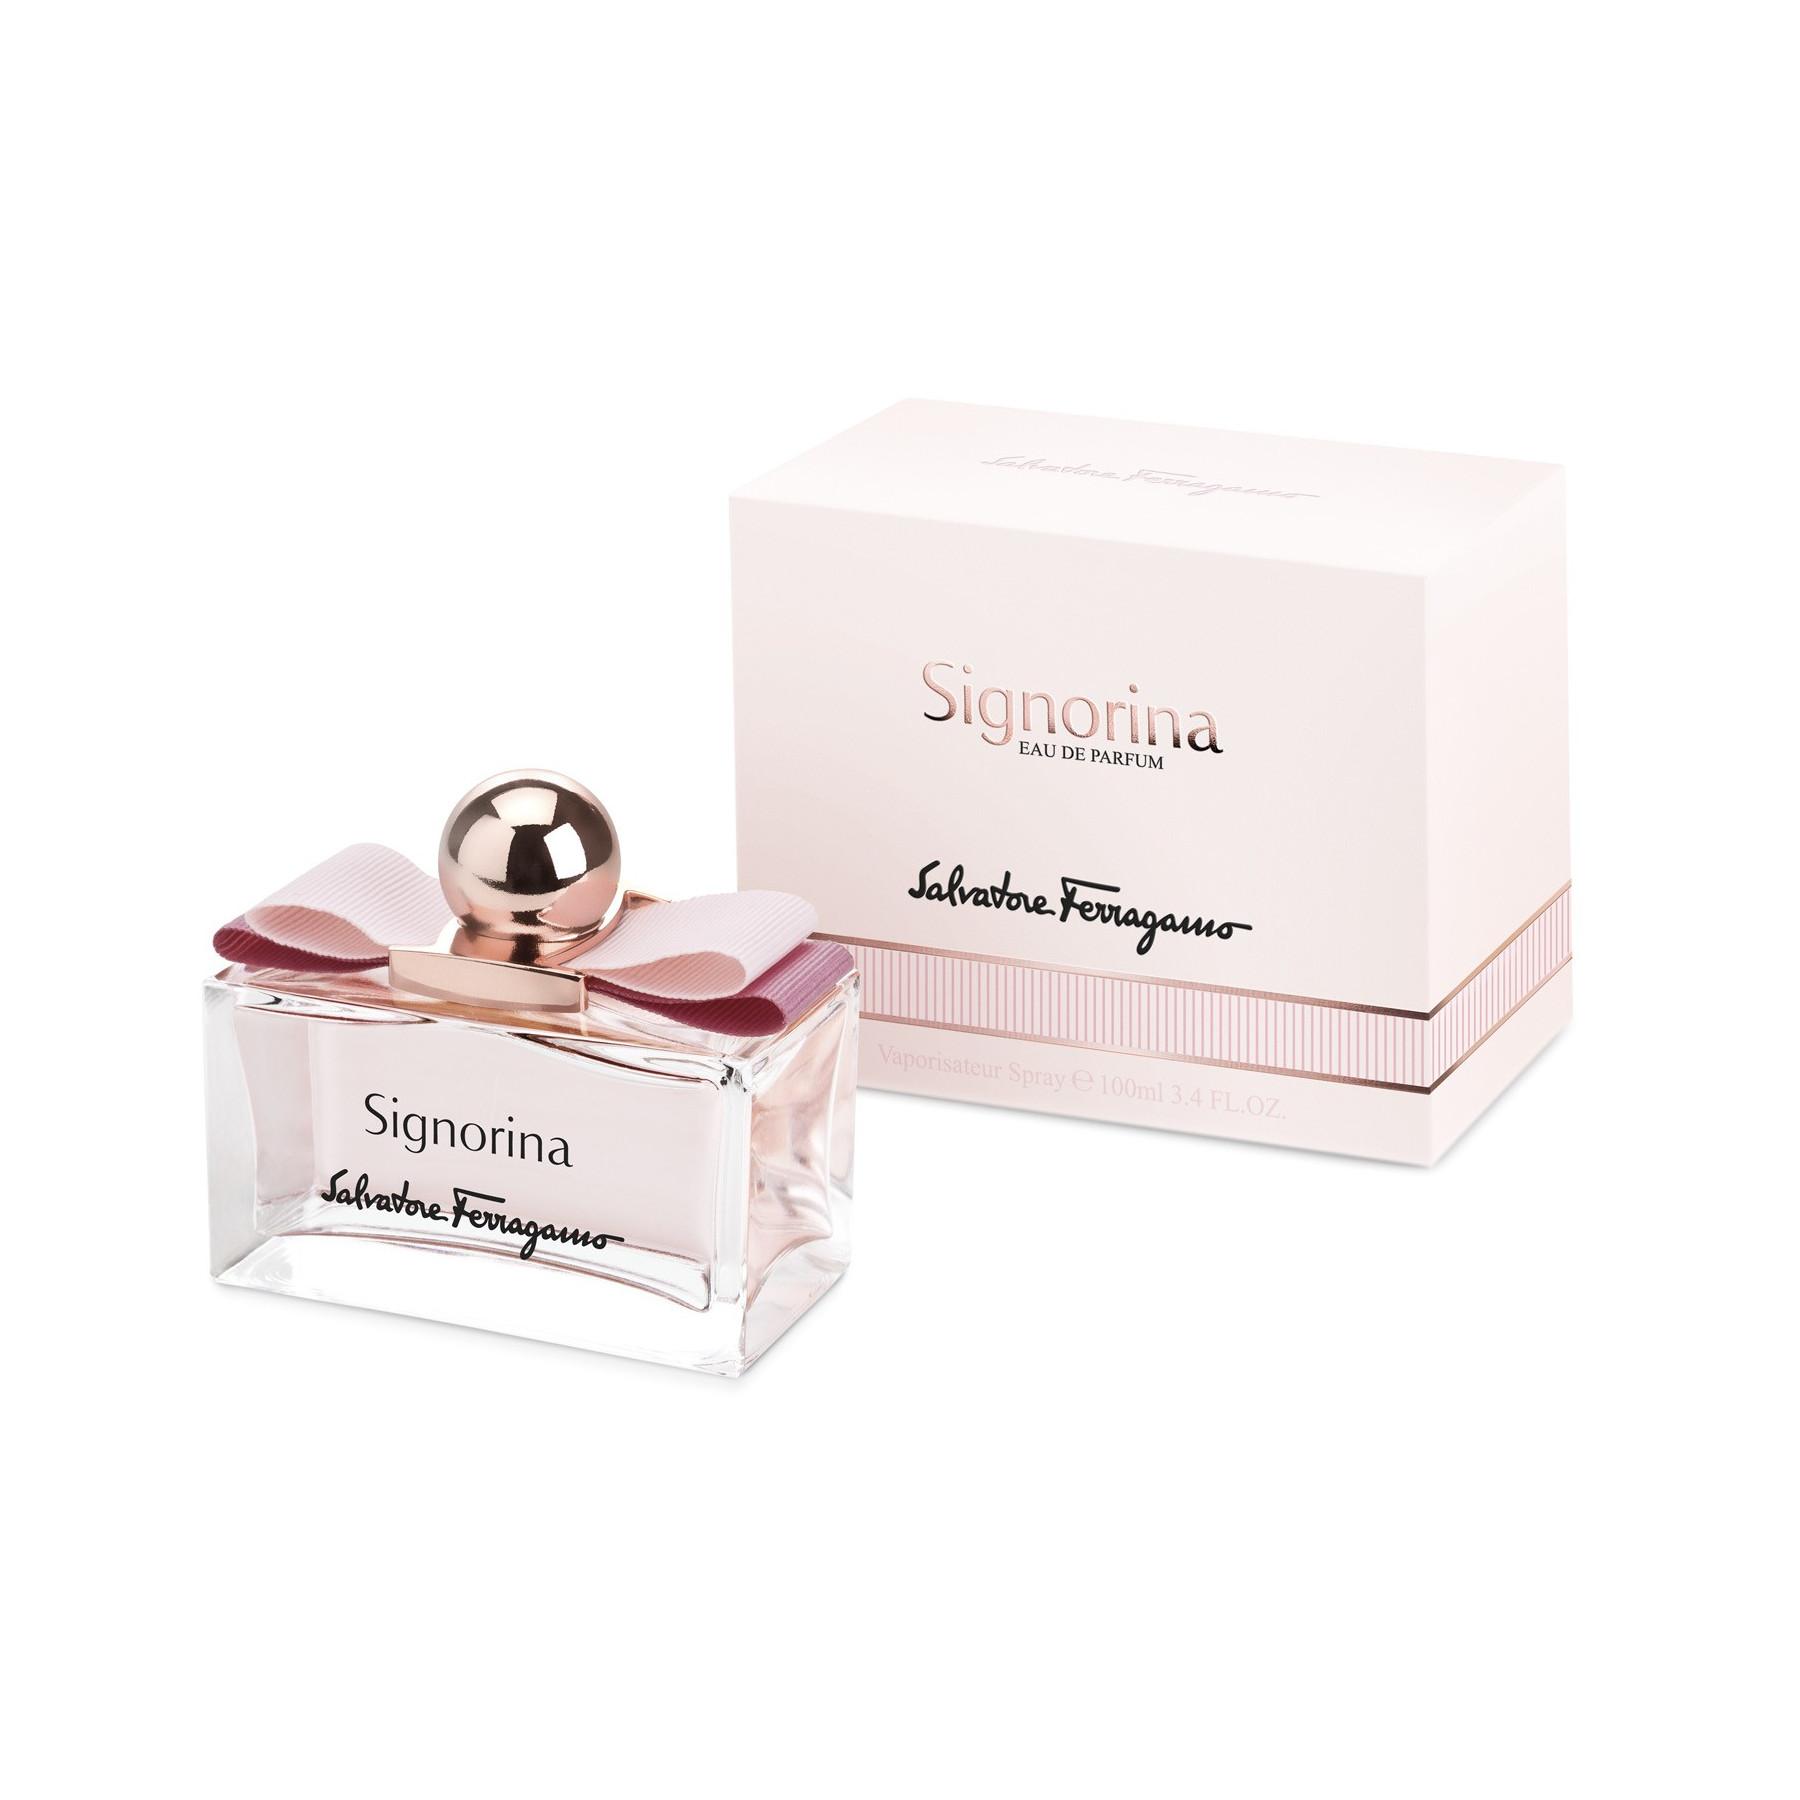 Salvatore Ferragamo Signorina - parfémová voda W Objem: 50 ml